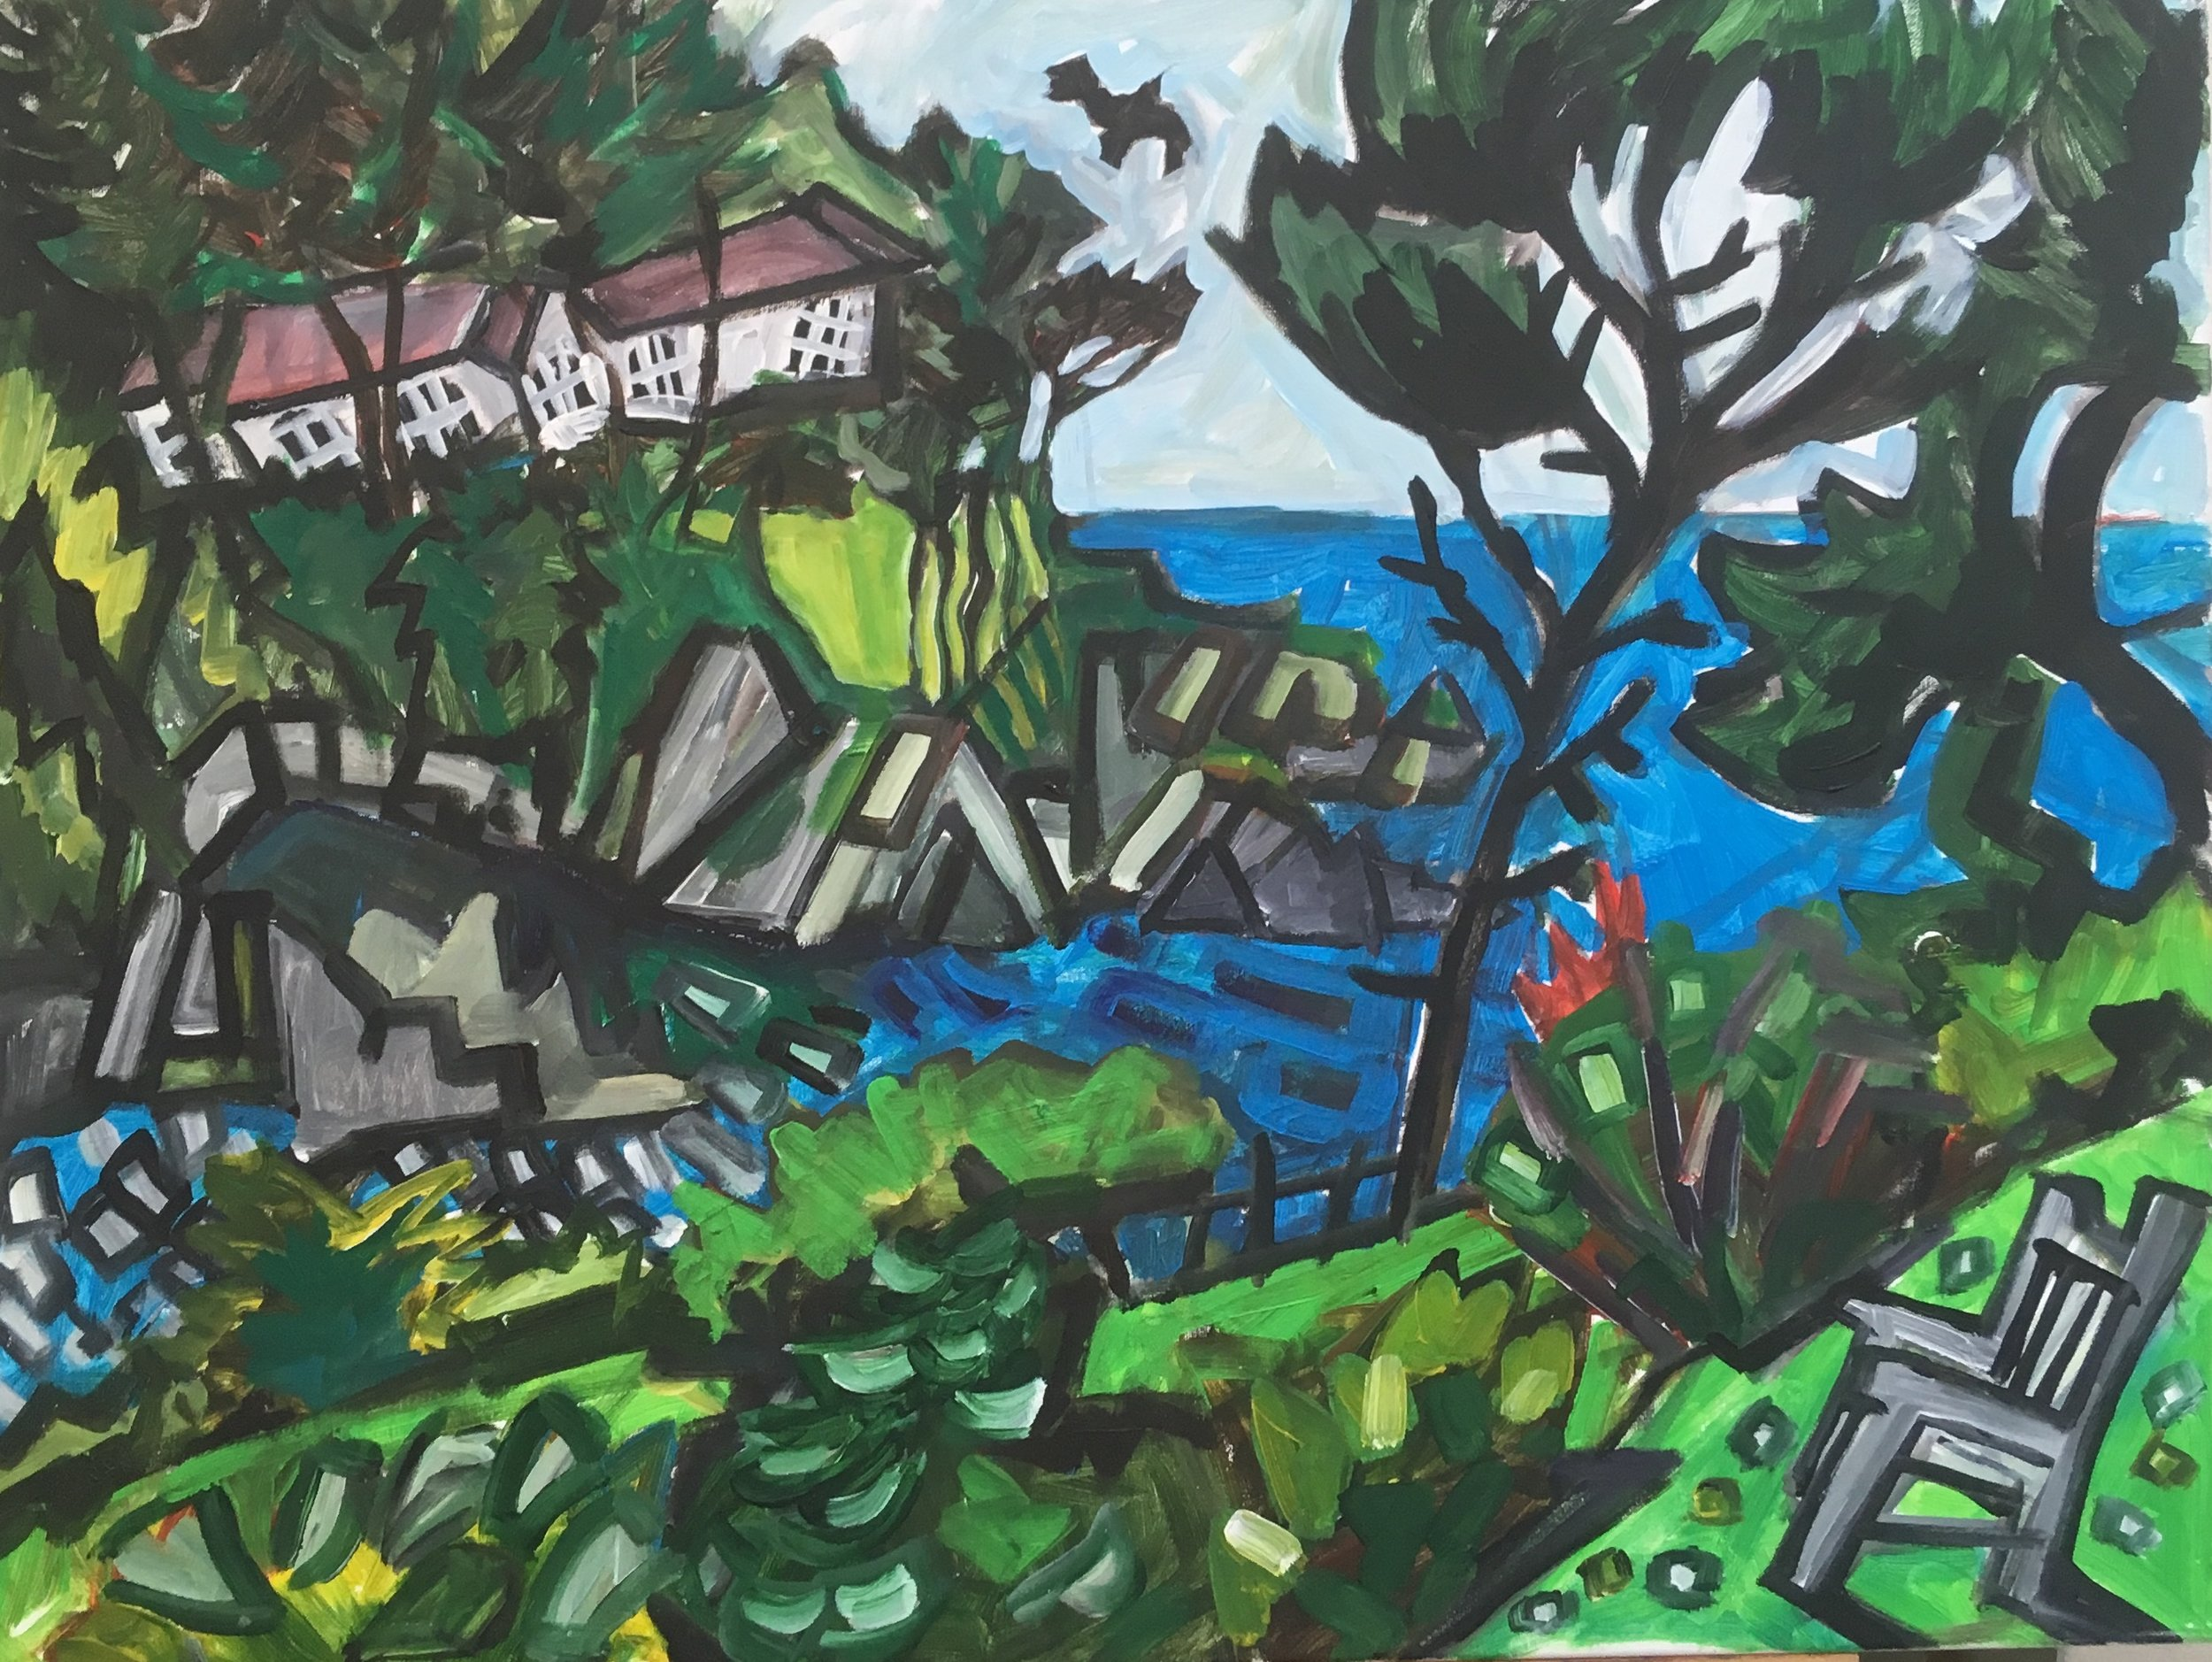 Lee Bay , Devon  acrylic on canvas  60 by 80 by 1.5 cm  £750  unframed